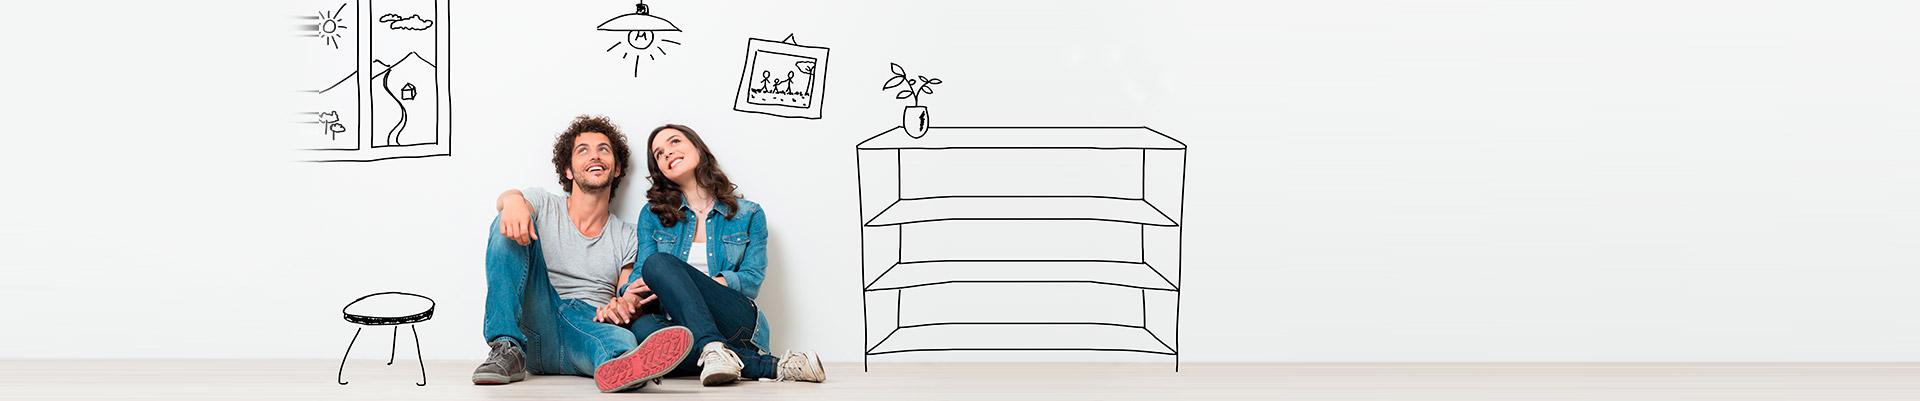 headers-producto-hogar-seguricomem